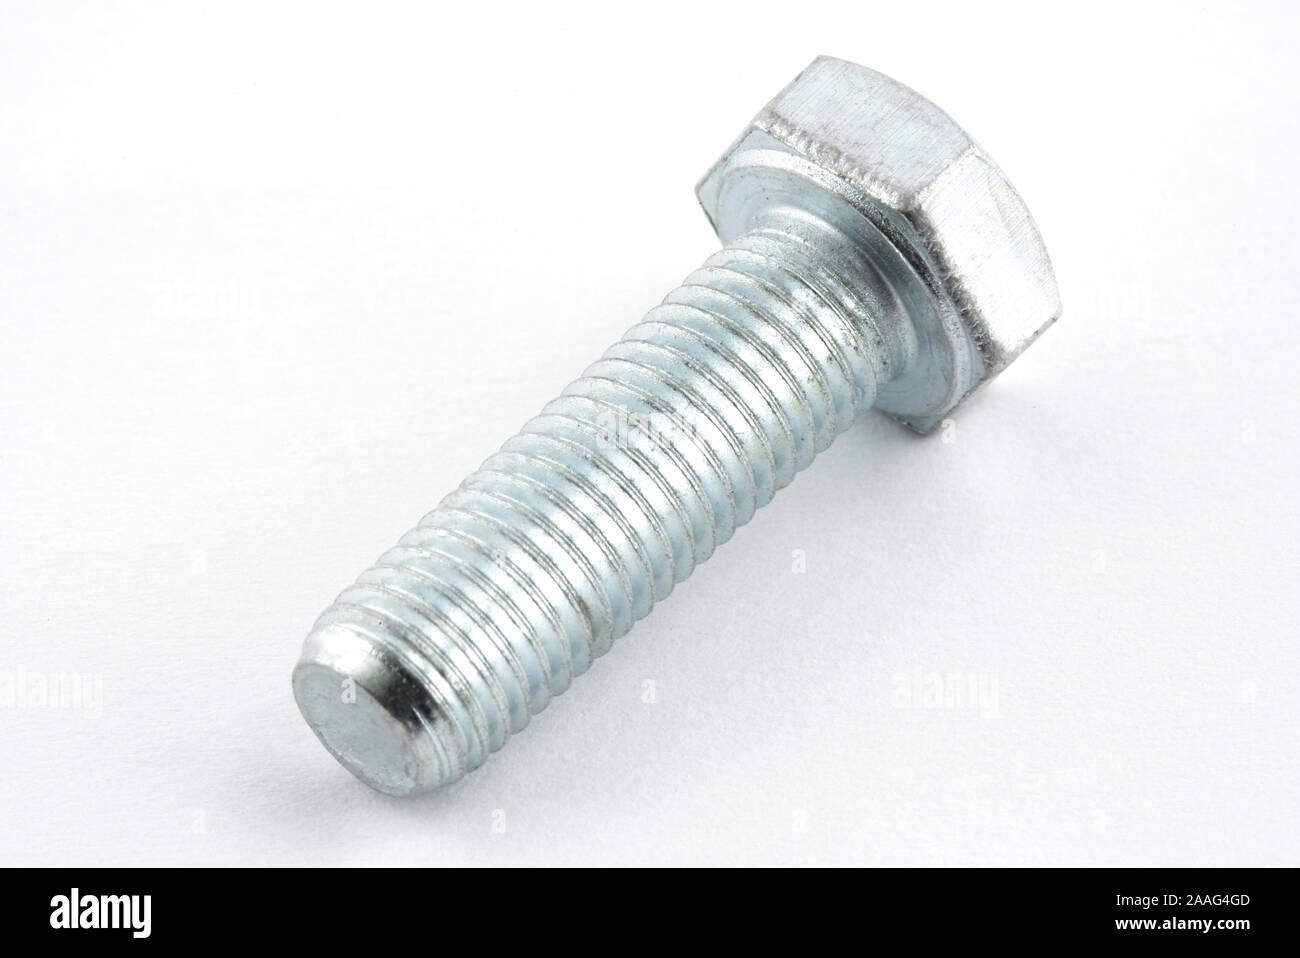 crome bolt on white background Stock Photo